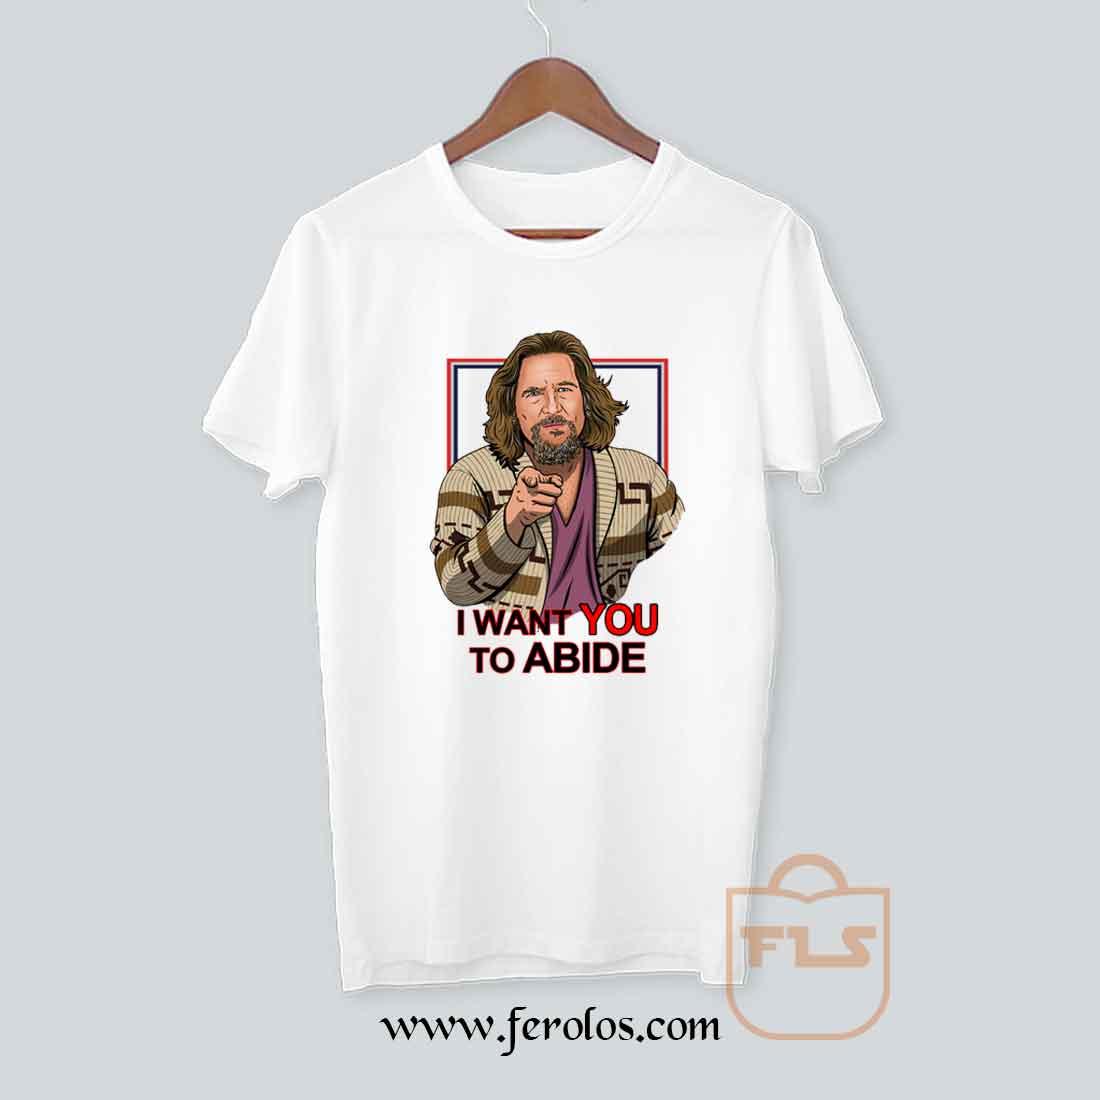 big lebowski t shirts